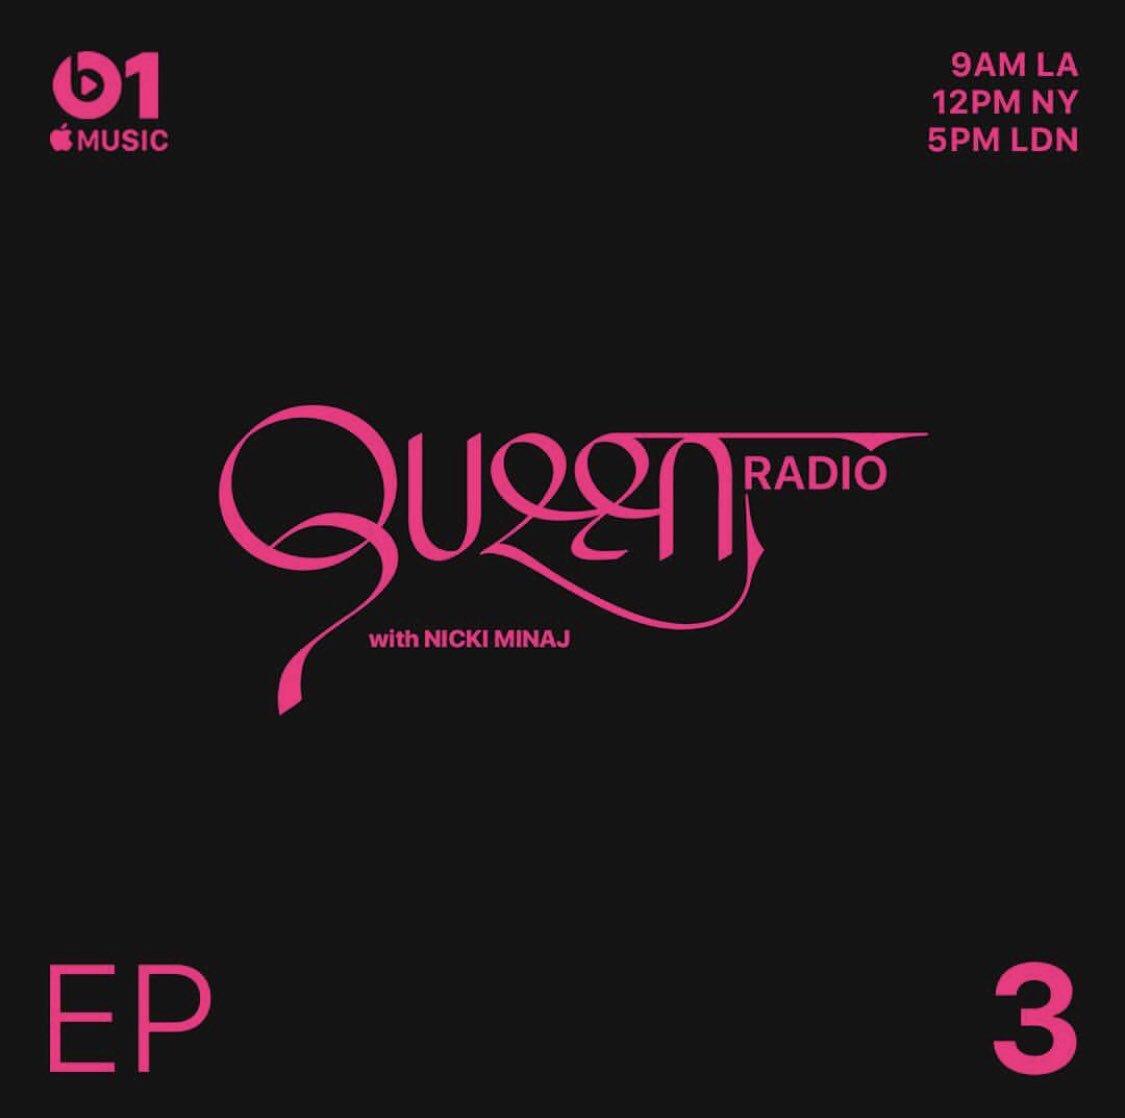 Tomorrow @ noon EST #QueenRadio @AppleMusic https://t.co/2Gi45YOodt